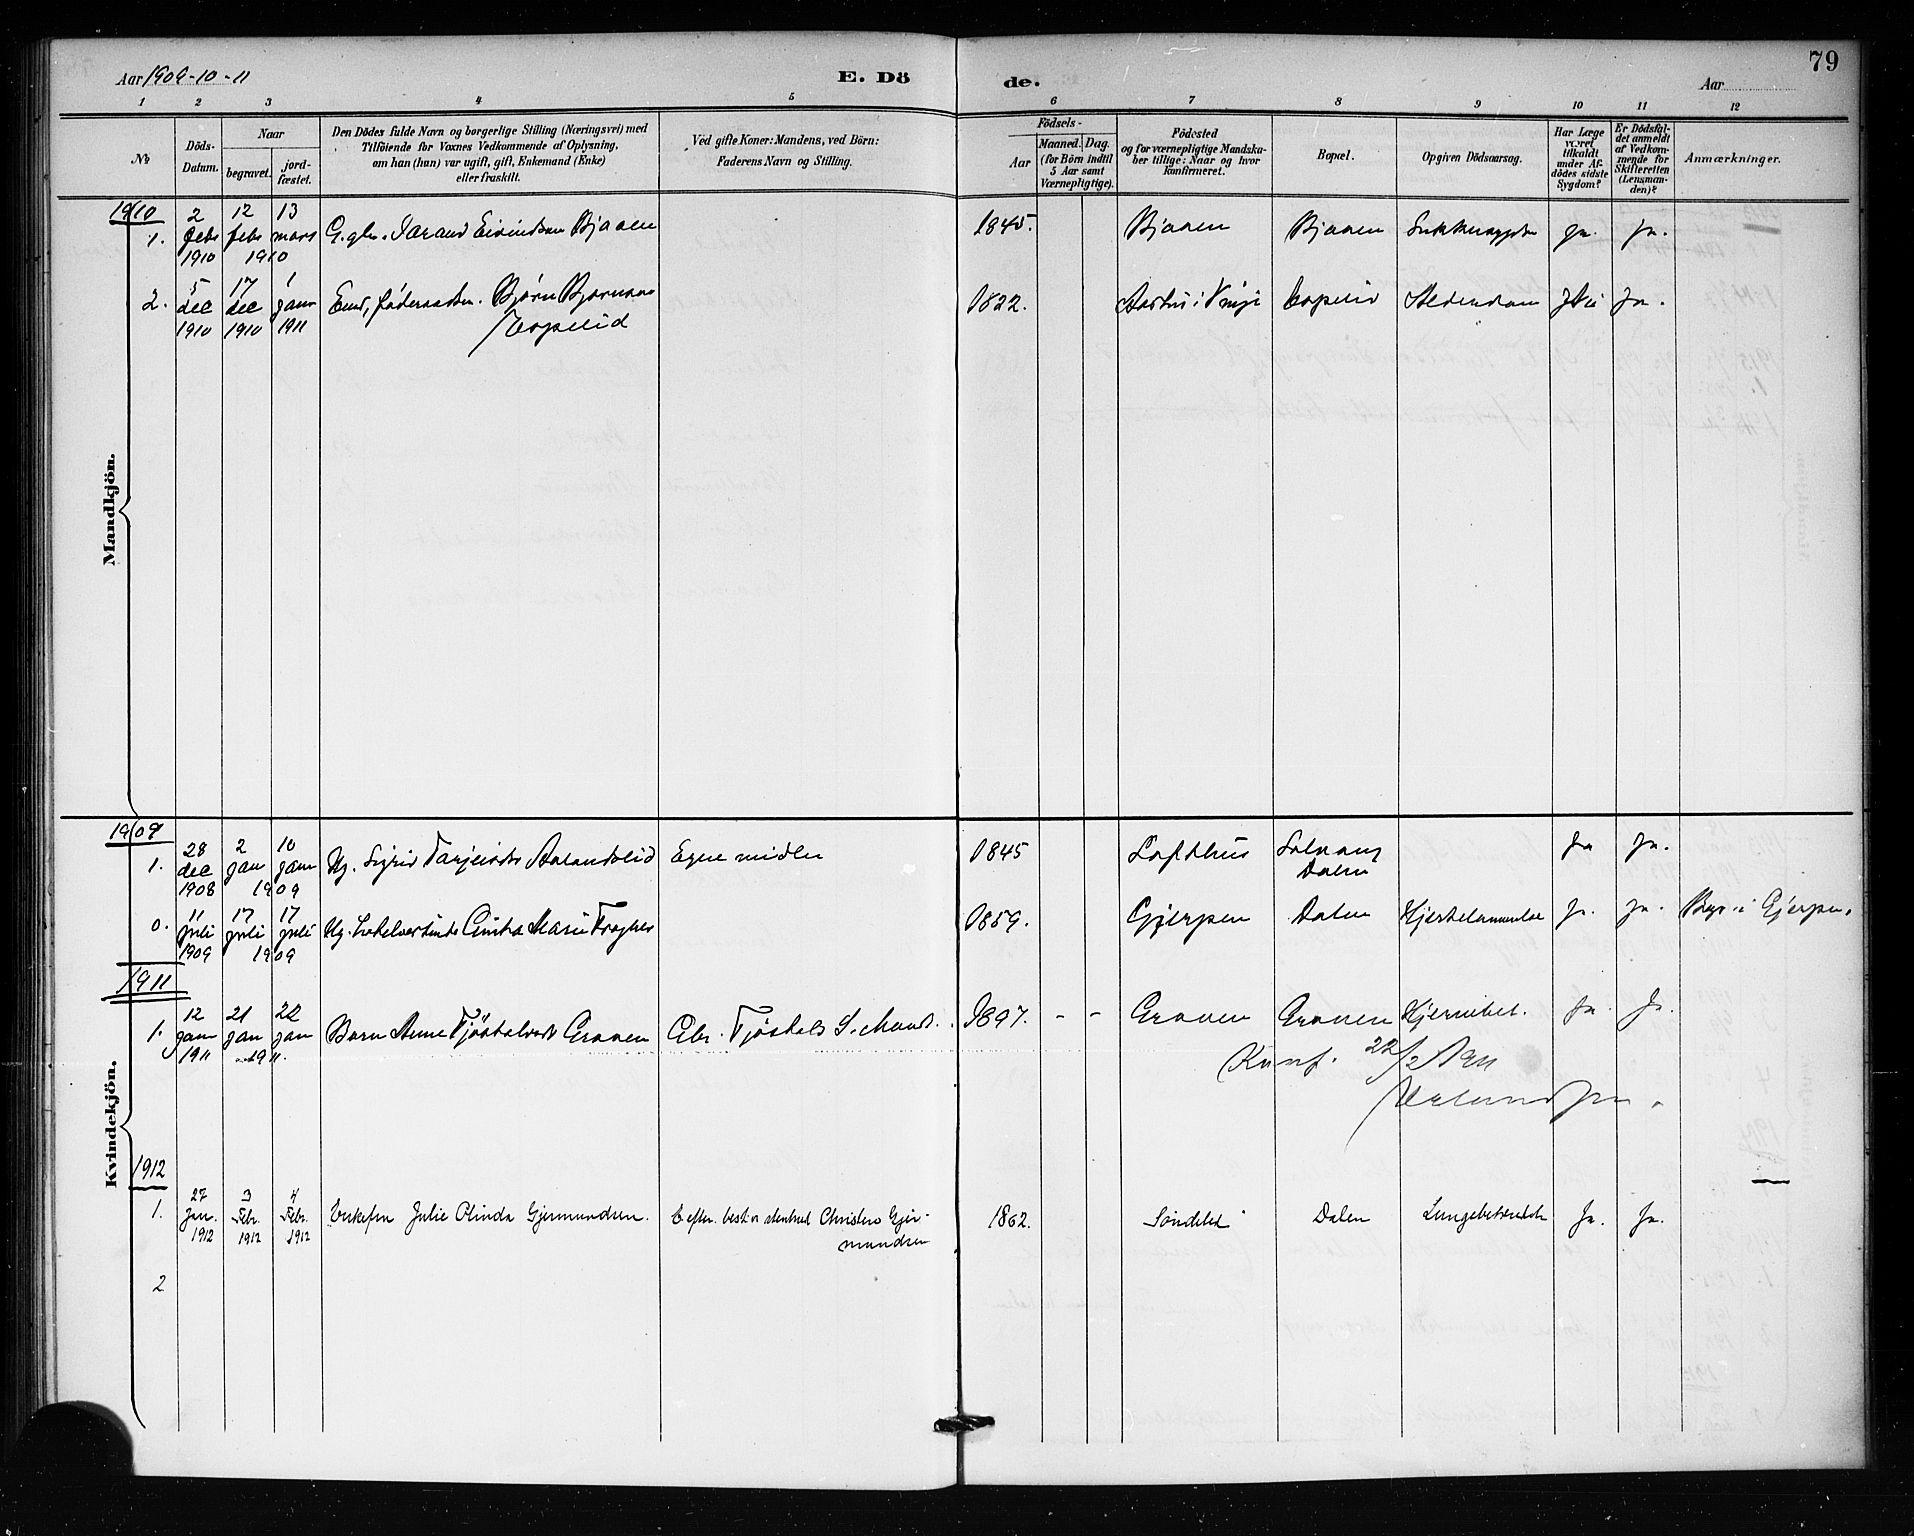 SAKO, Lårdal kirkebøker, G/Gb/L0003: Klokkerbok nr. II 3, 1889-1920, s. 79